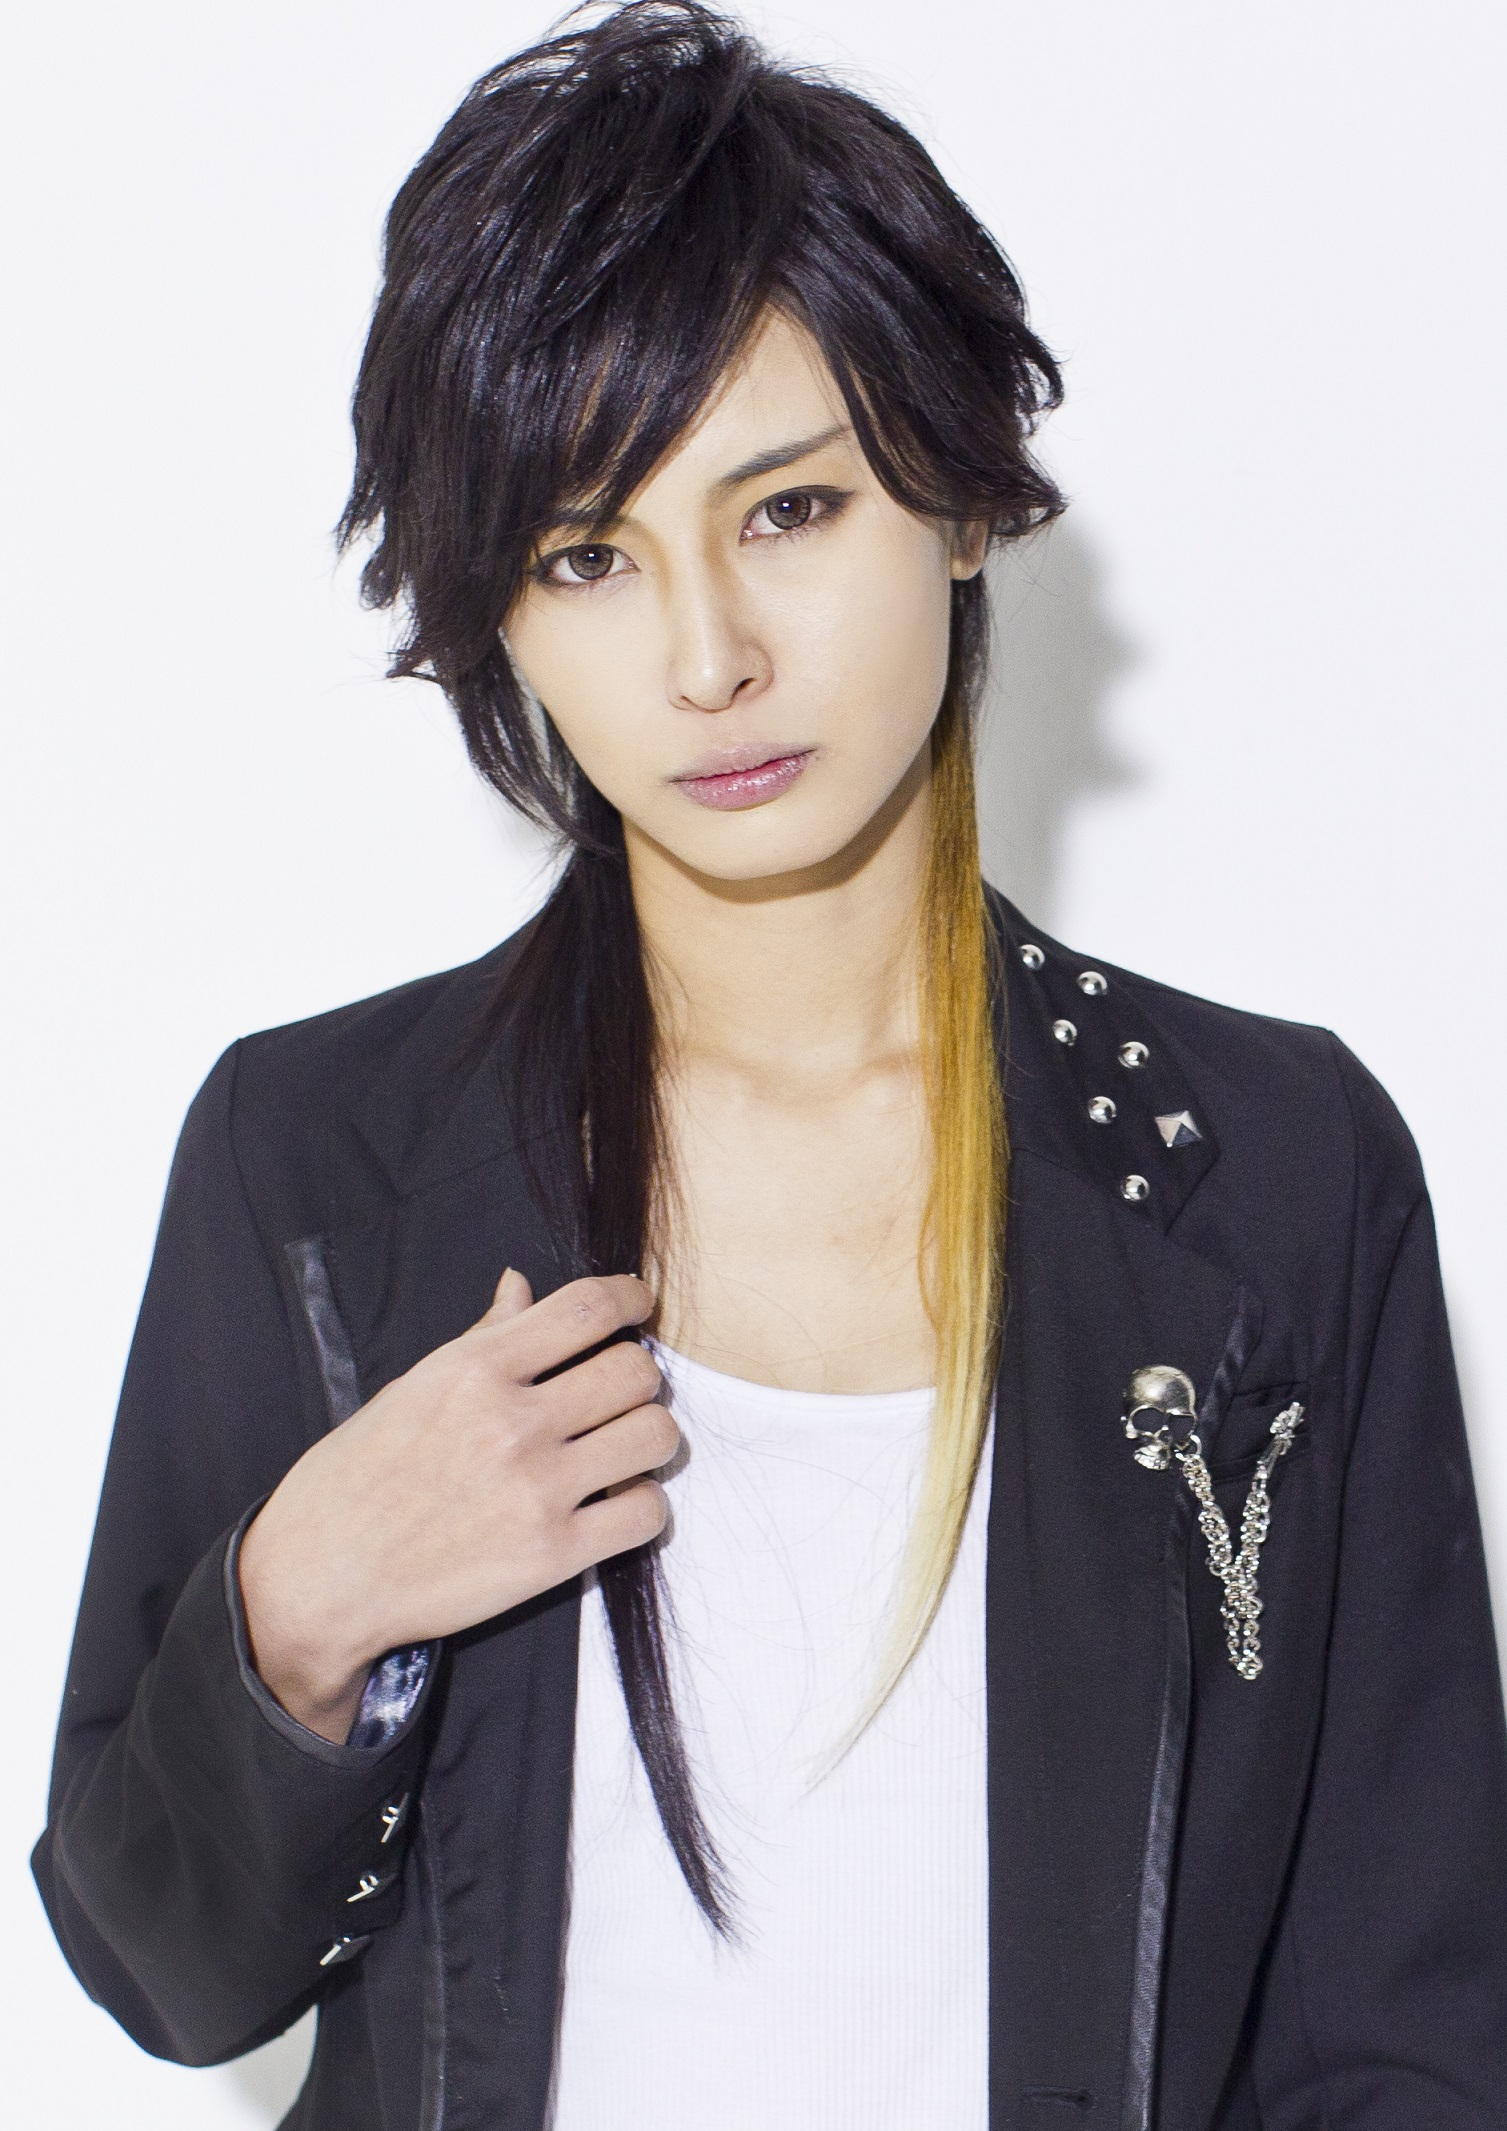 AKIRAのプロフィール写真